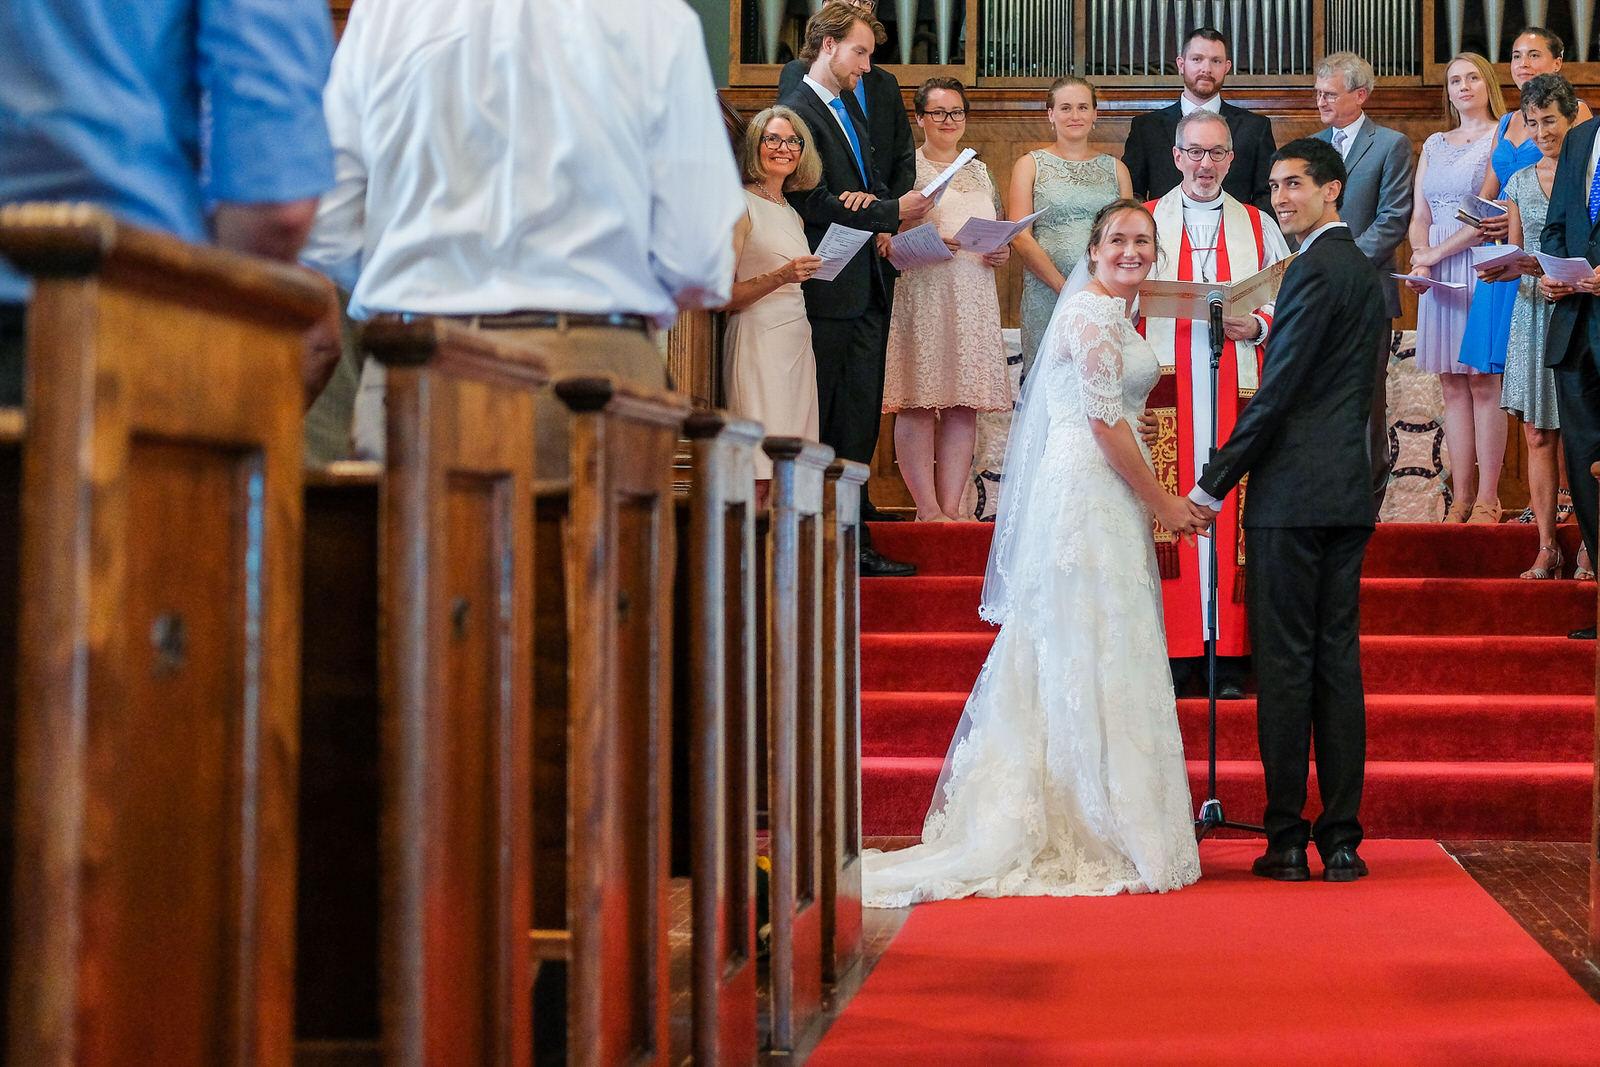 candid-vermont-wedding-photography-580.jpg